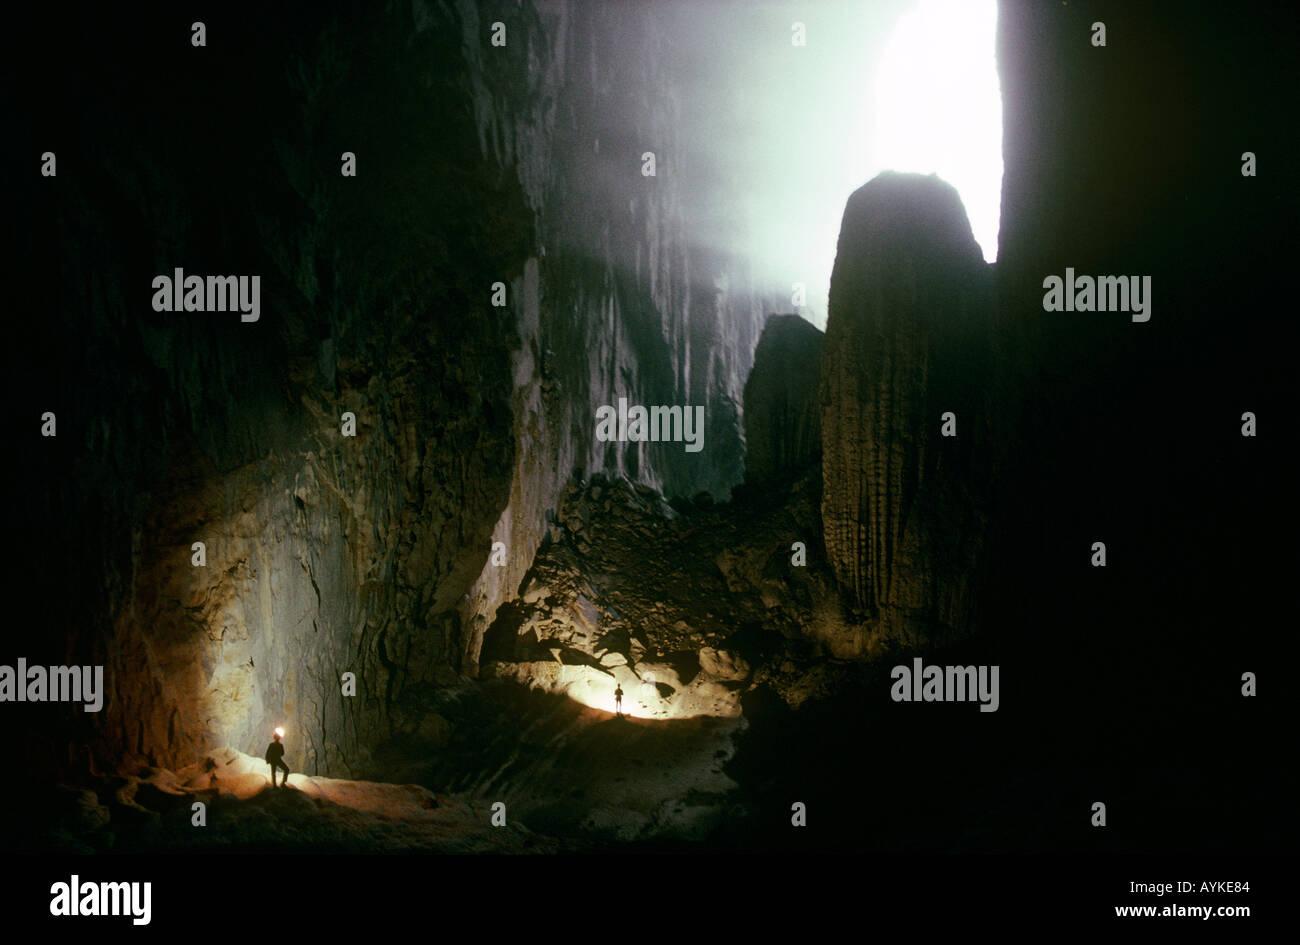 Ma Wang Dong cave system Guangxi China Stock Photo, Royalty Free ...